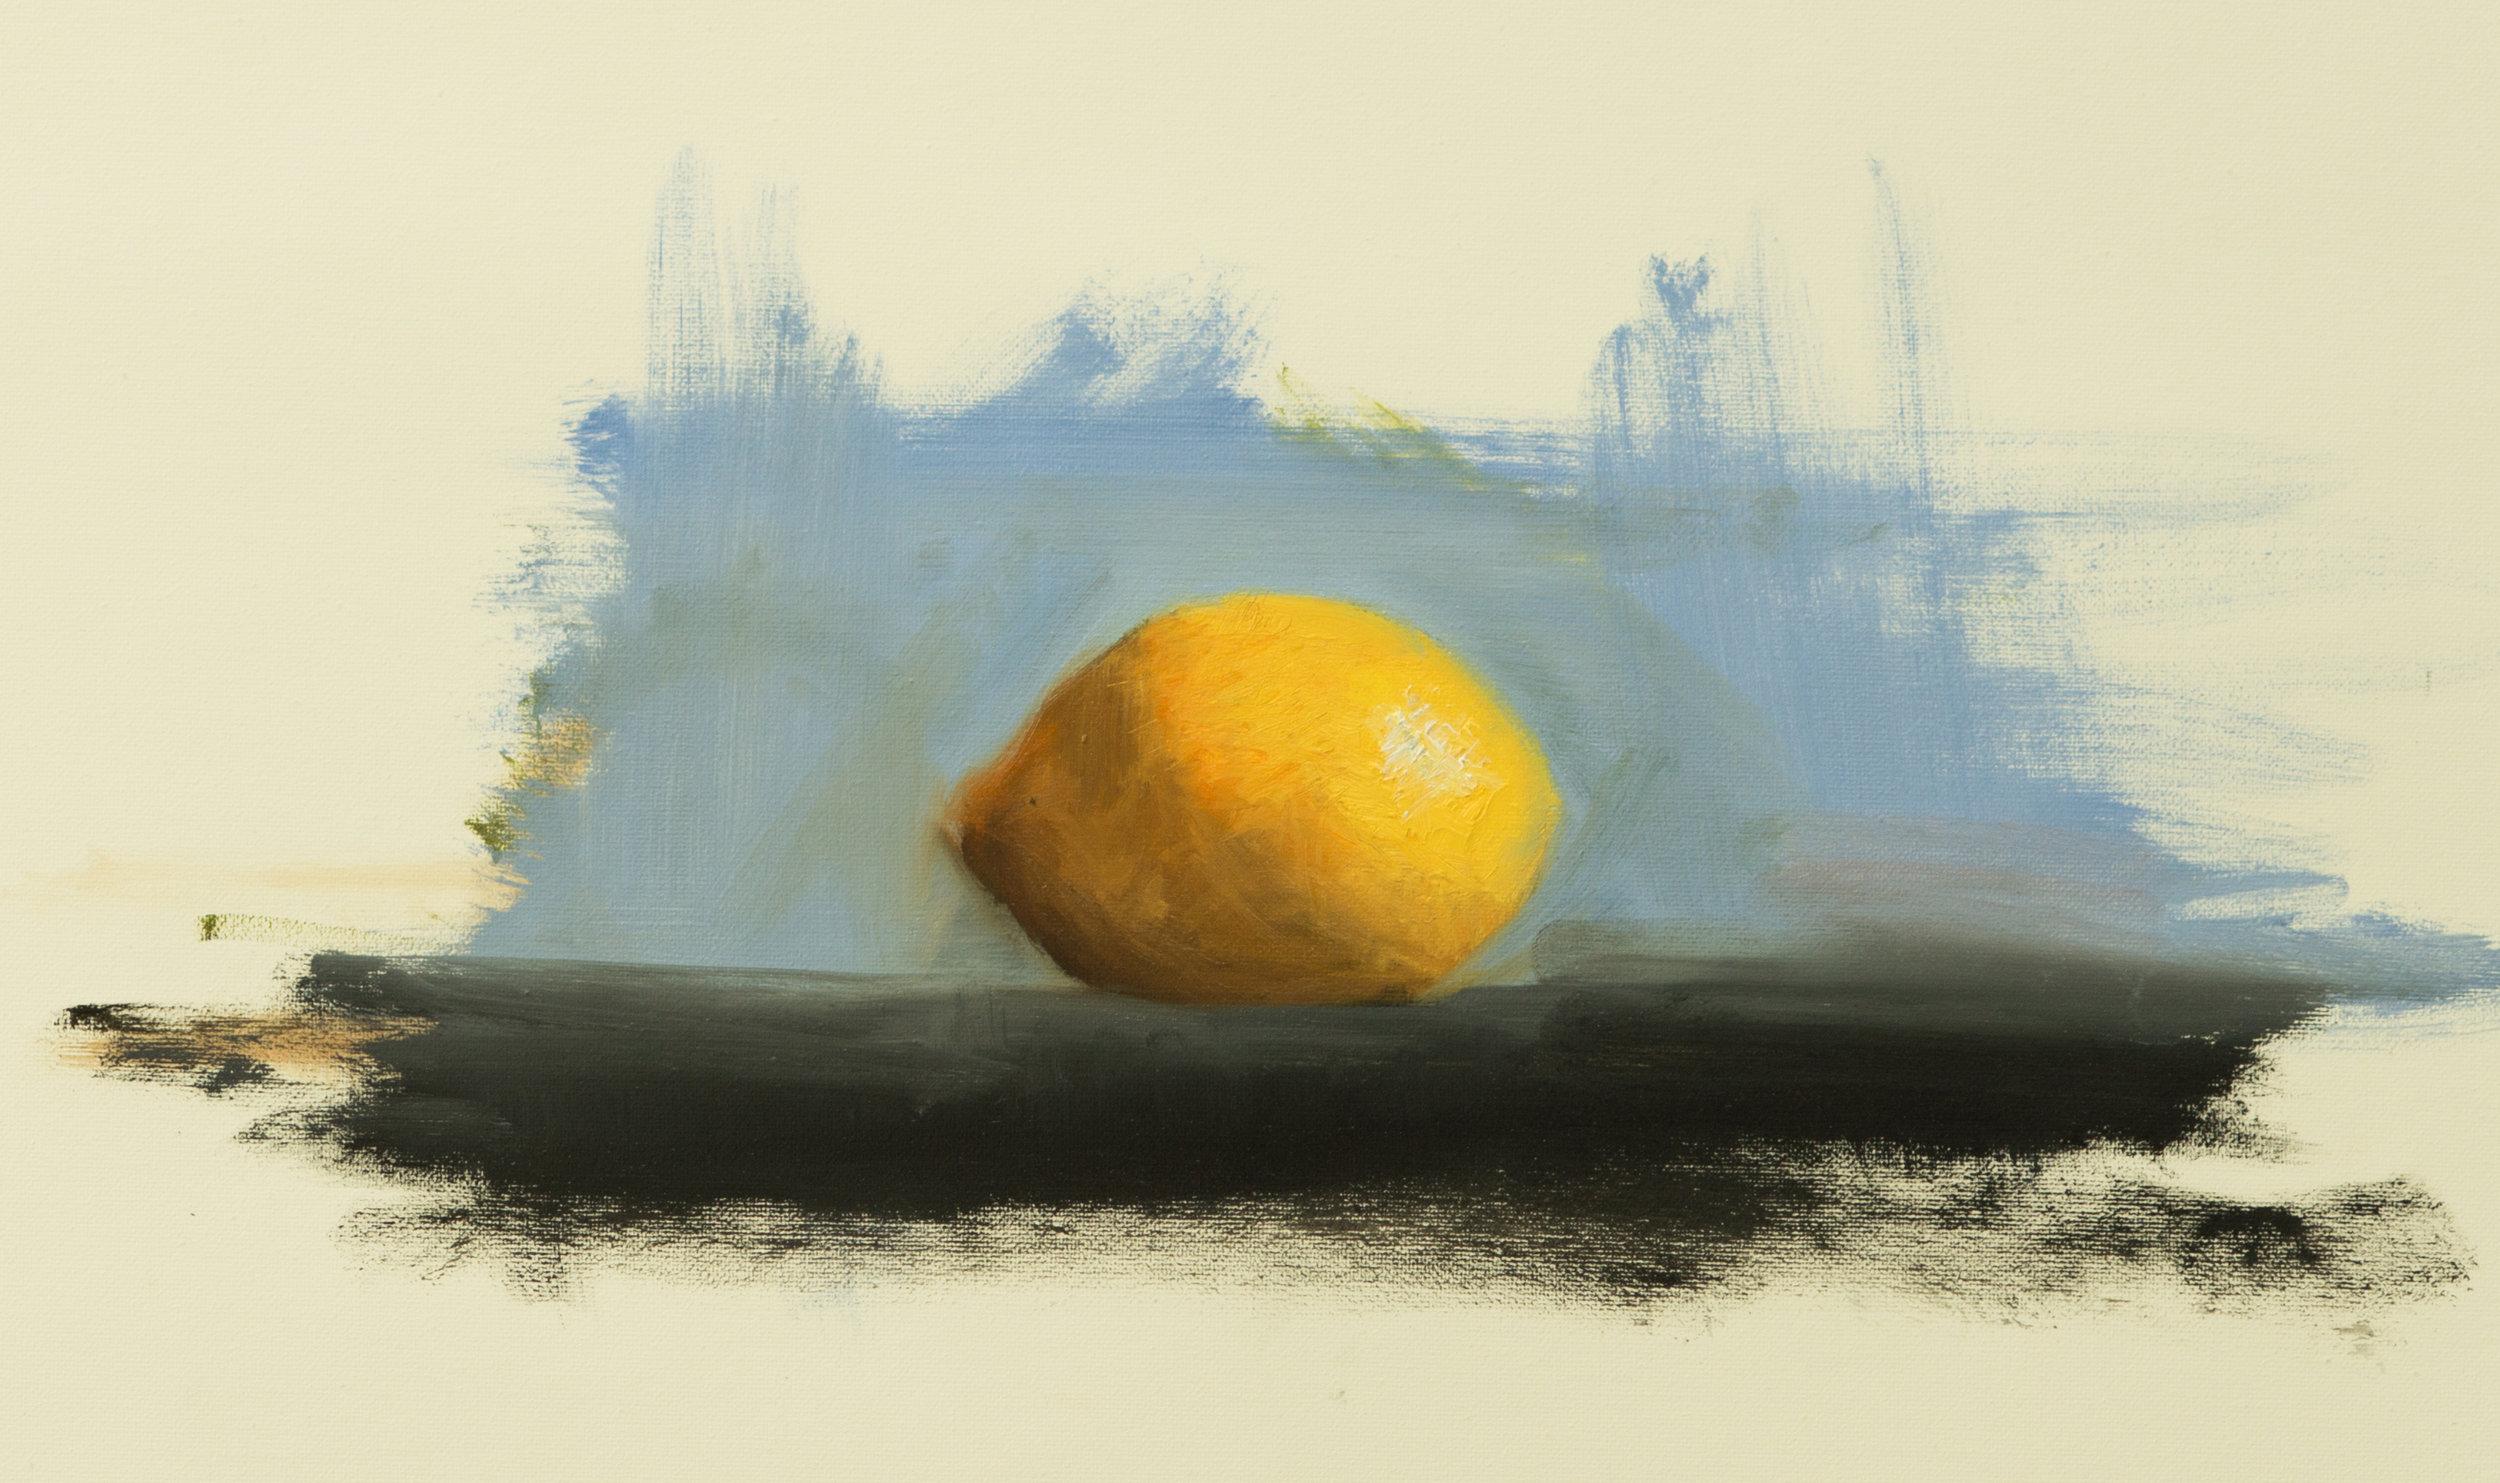 "'lemon study'  Medium: Oil on canvas Size: 11"" x 15"" / 27cm x 40cm   SOLD   studio@michaelsydneymoore.com for inquiries"